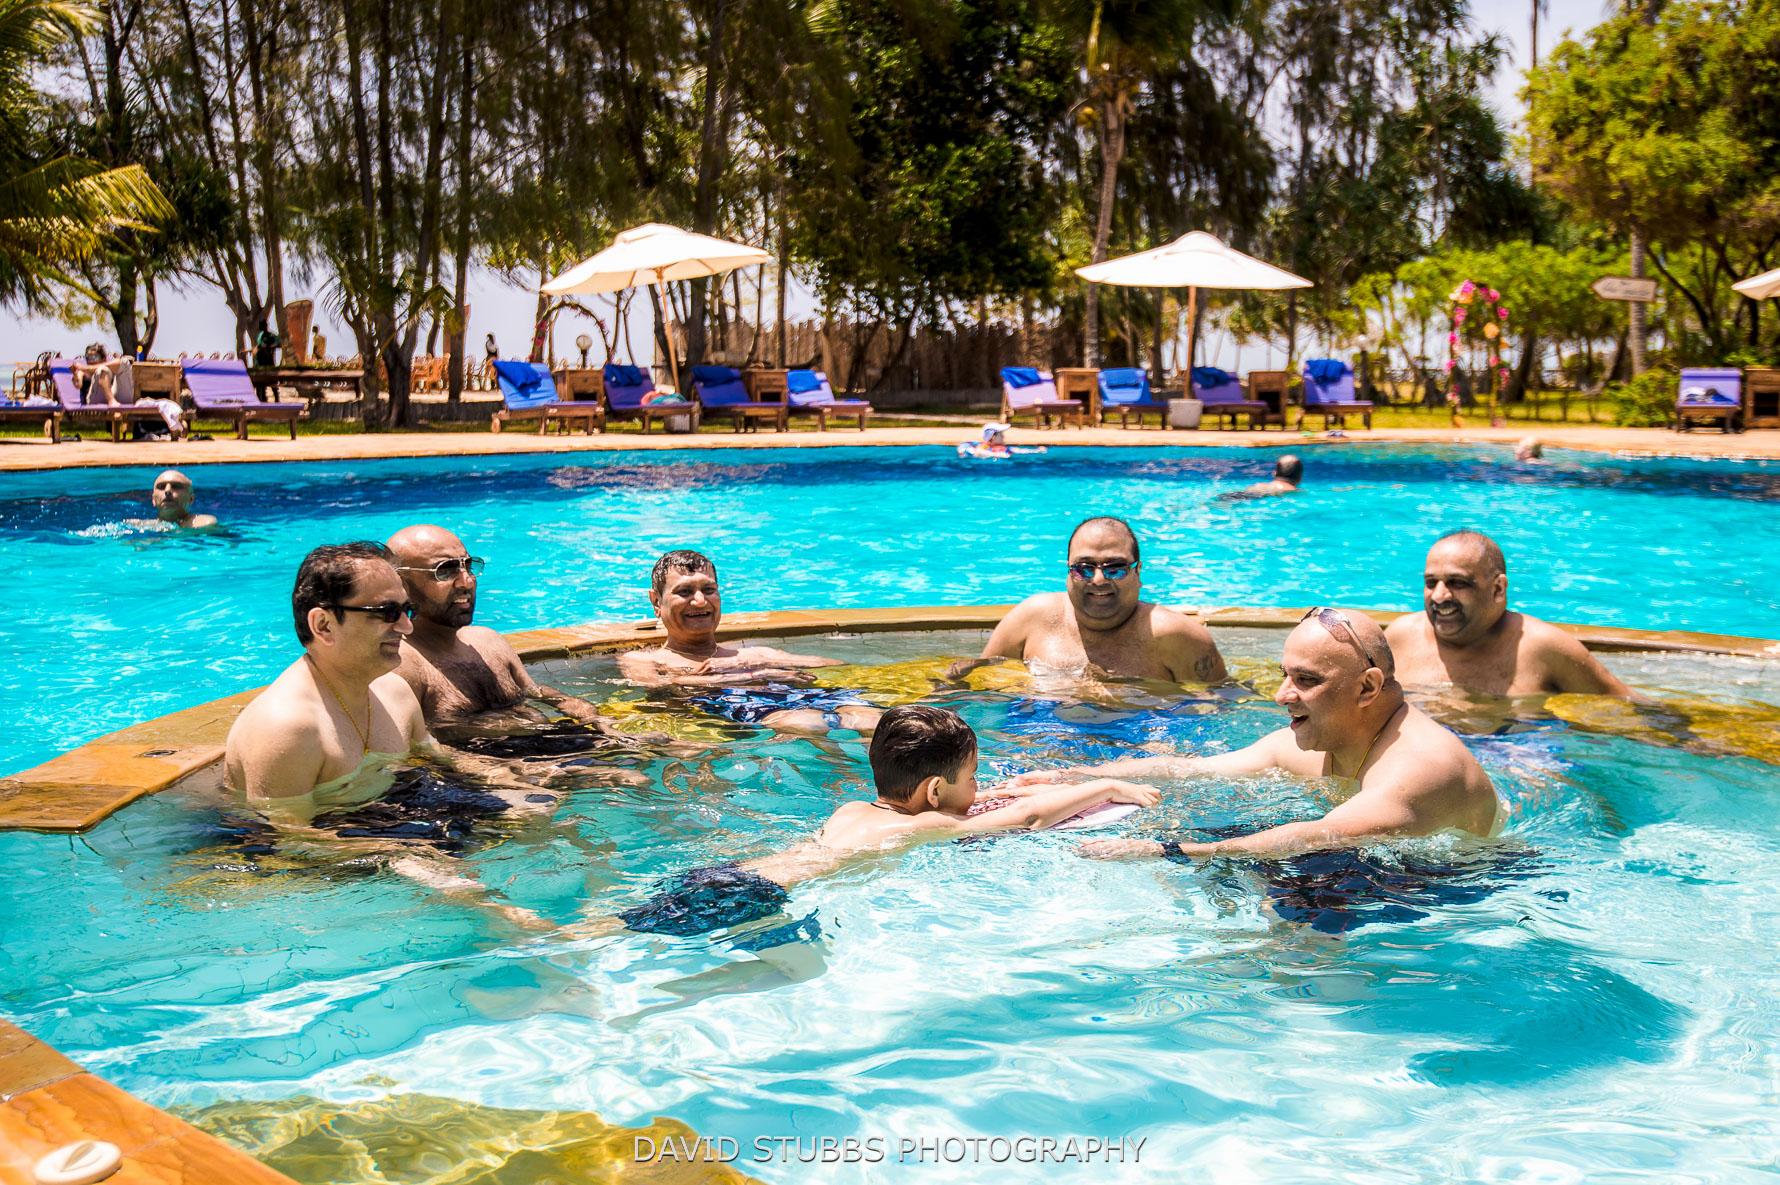 int he pool